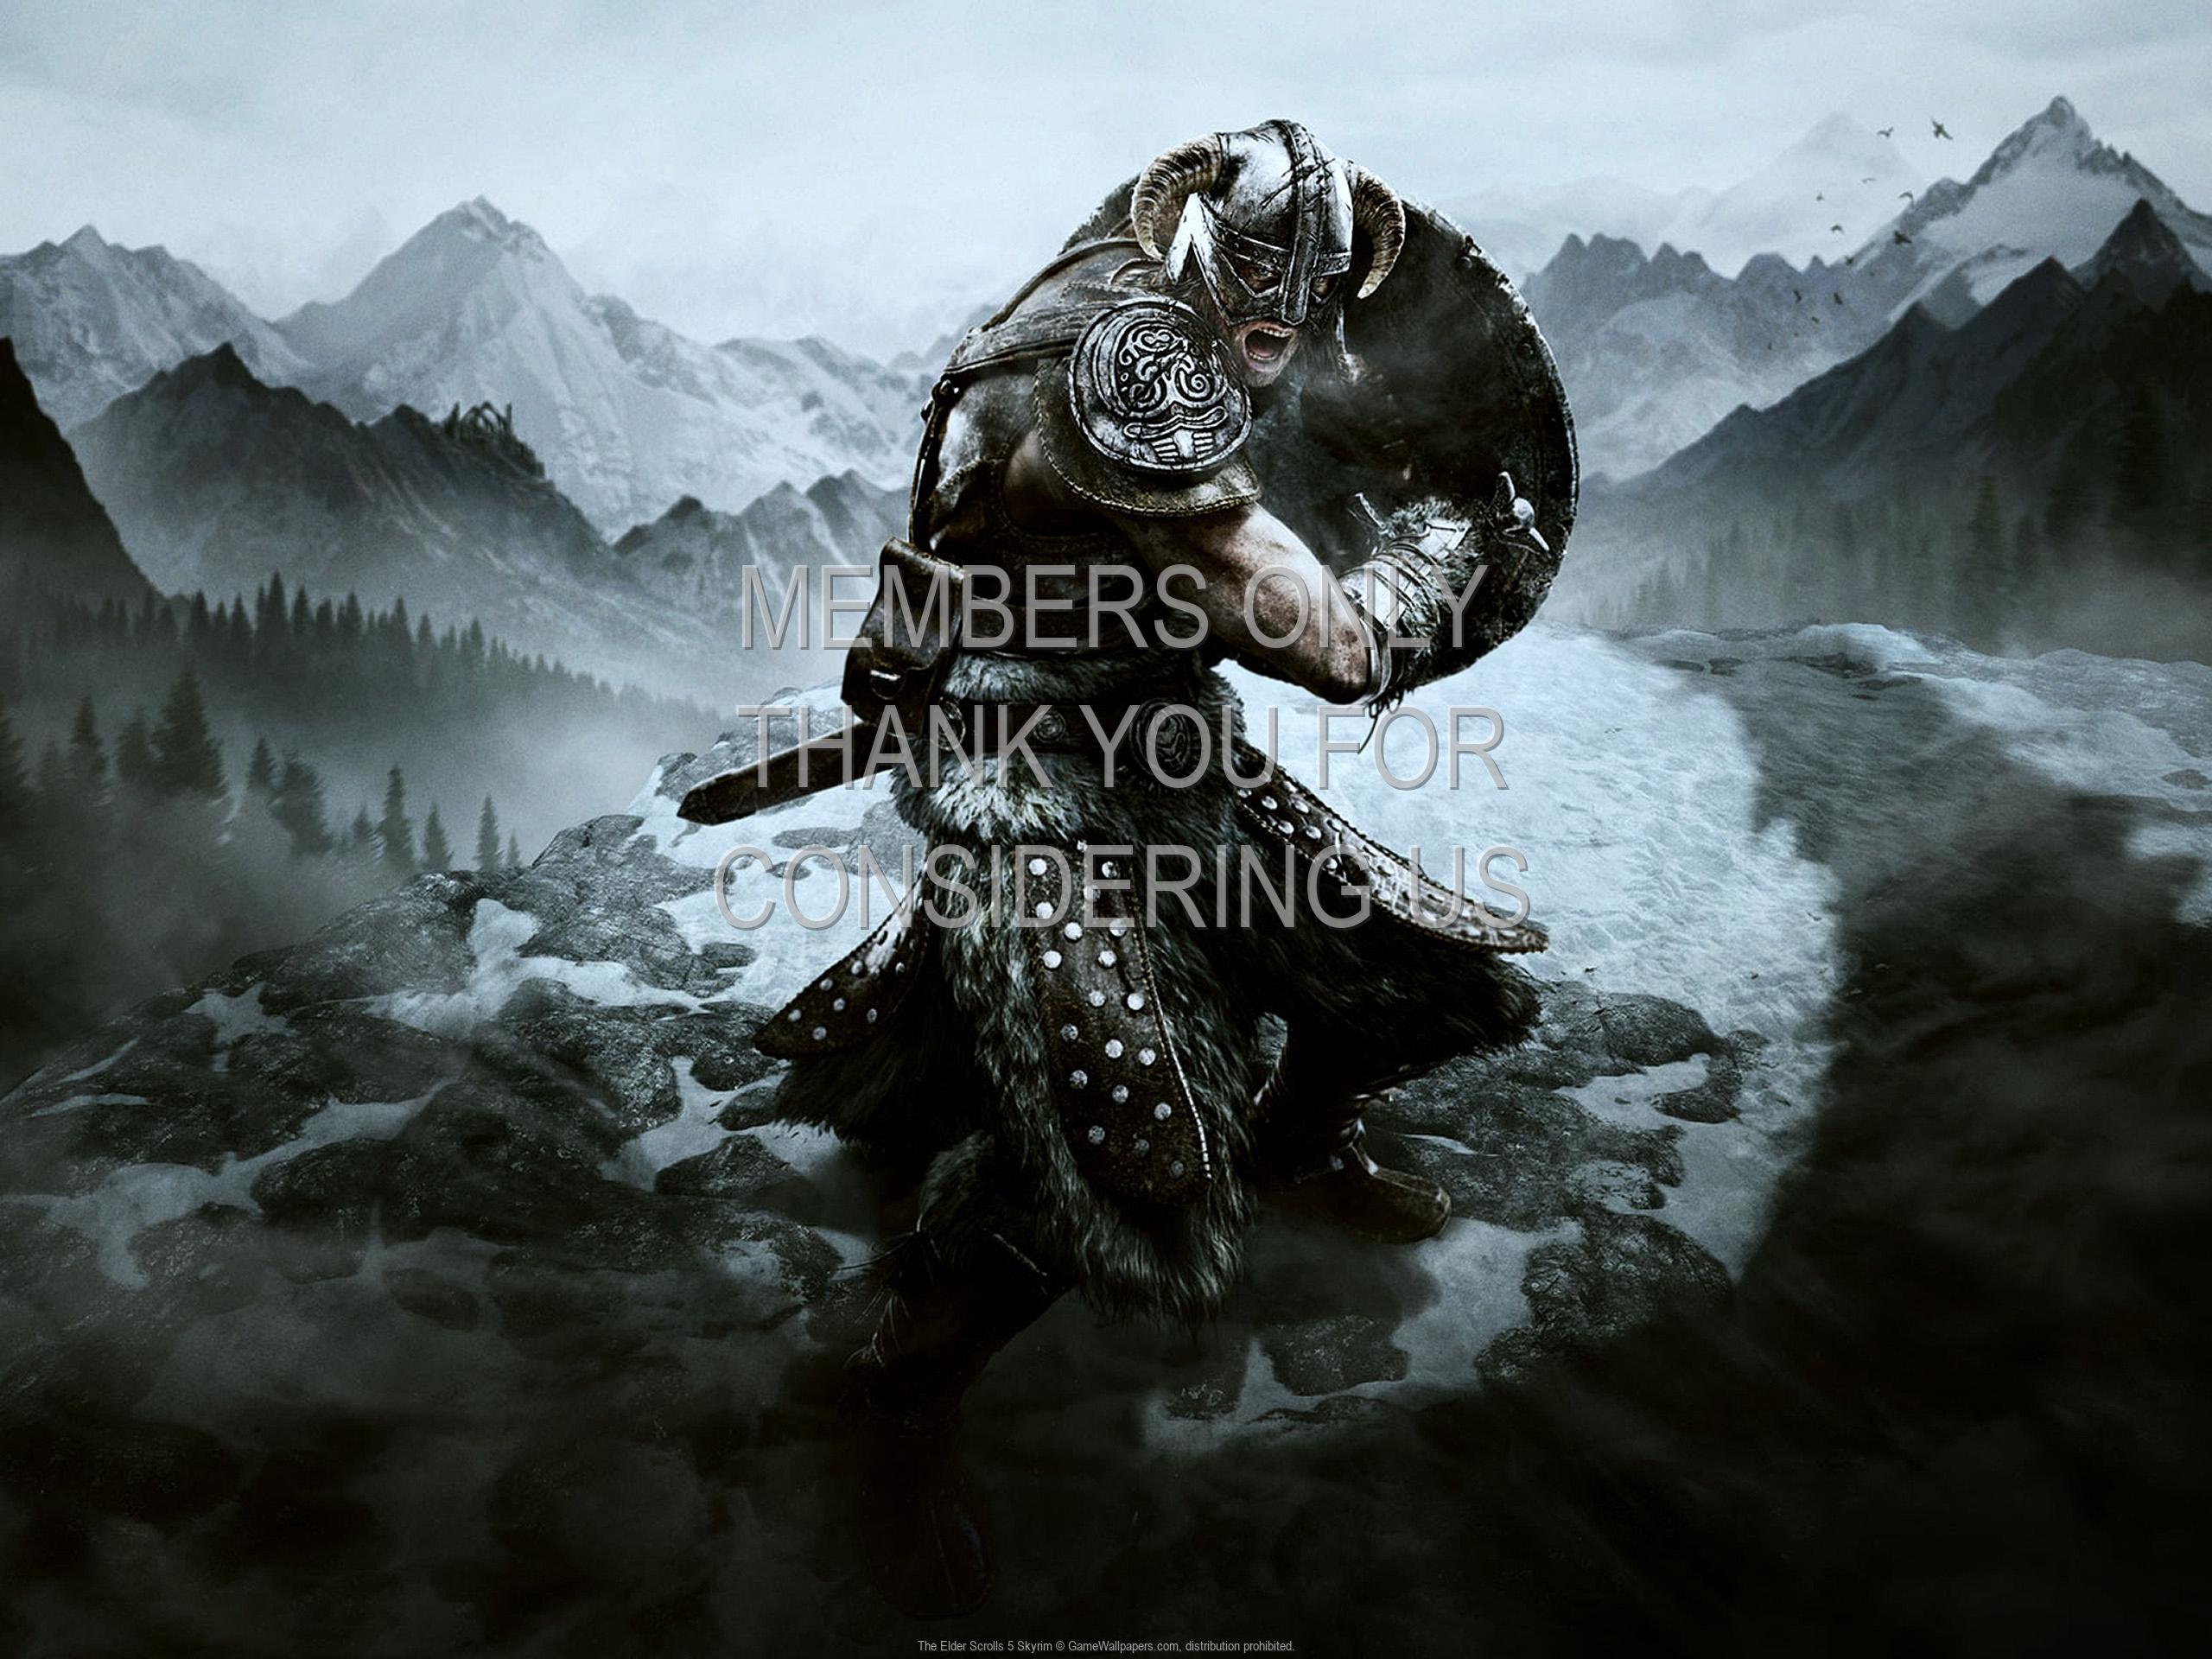 The Elder Scrolls 5: Skyrim 1920x1080 Handy Hintergrundbild 03